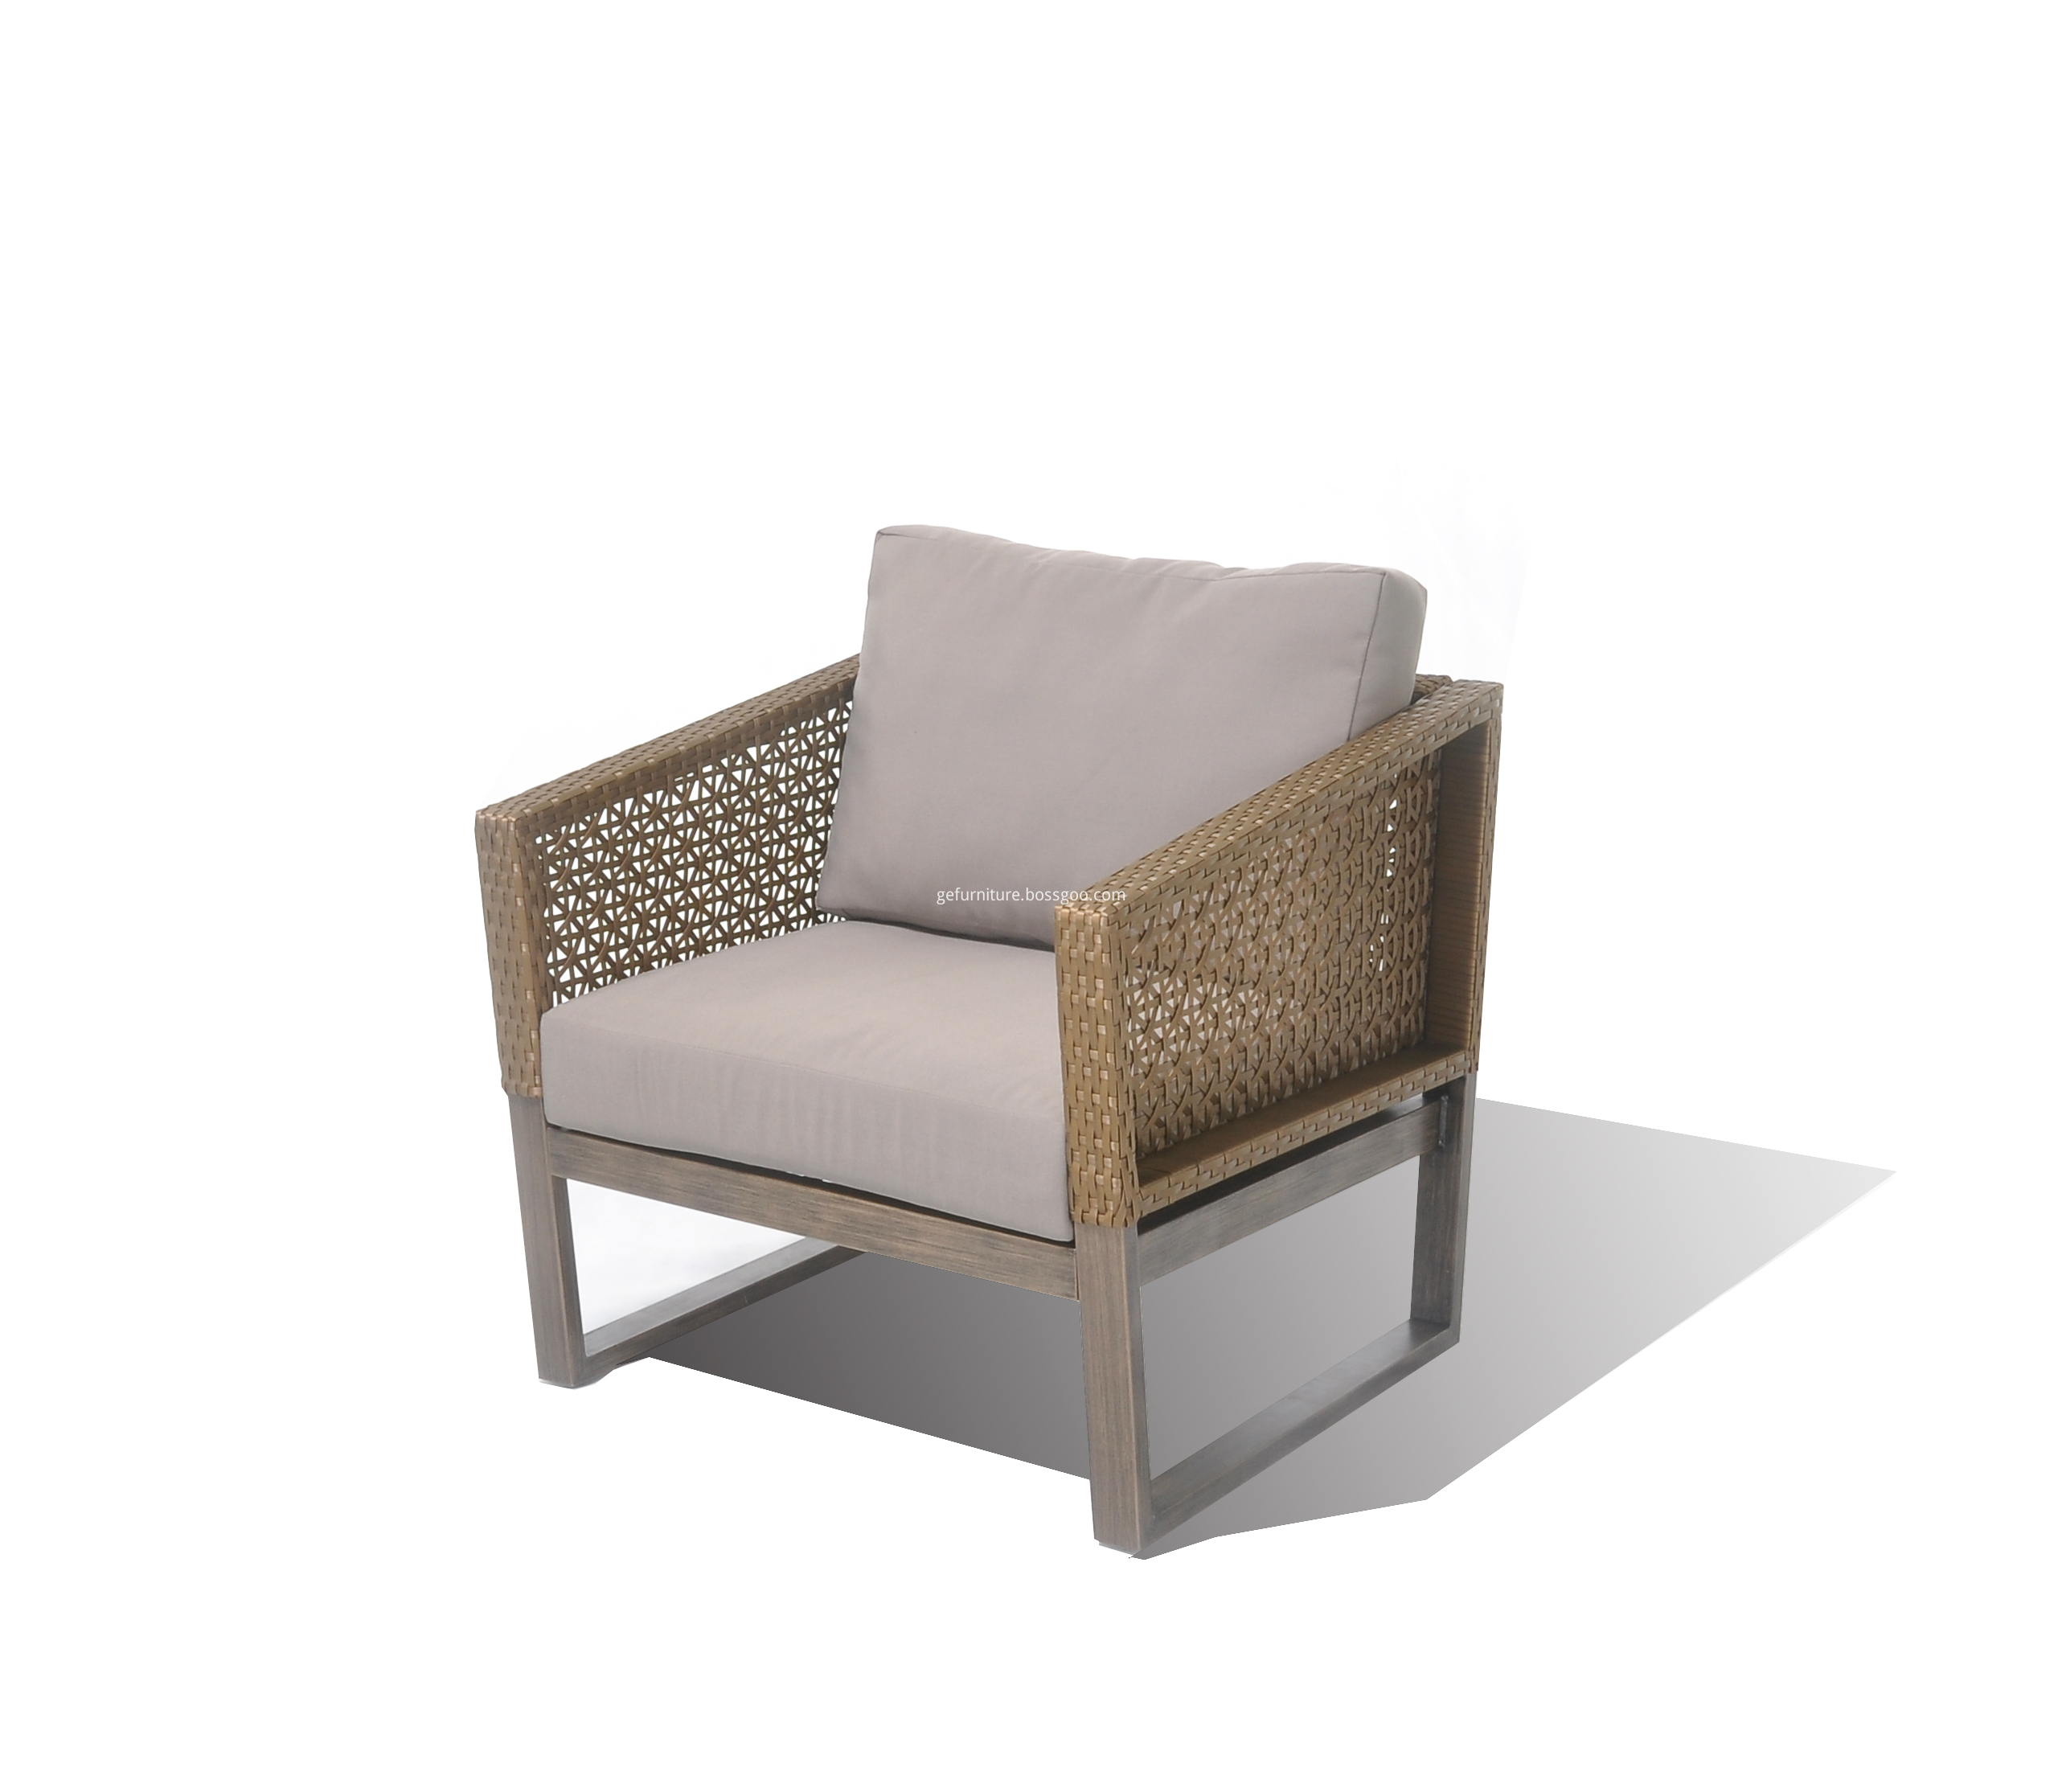 Waterproof Fabric Chair